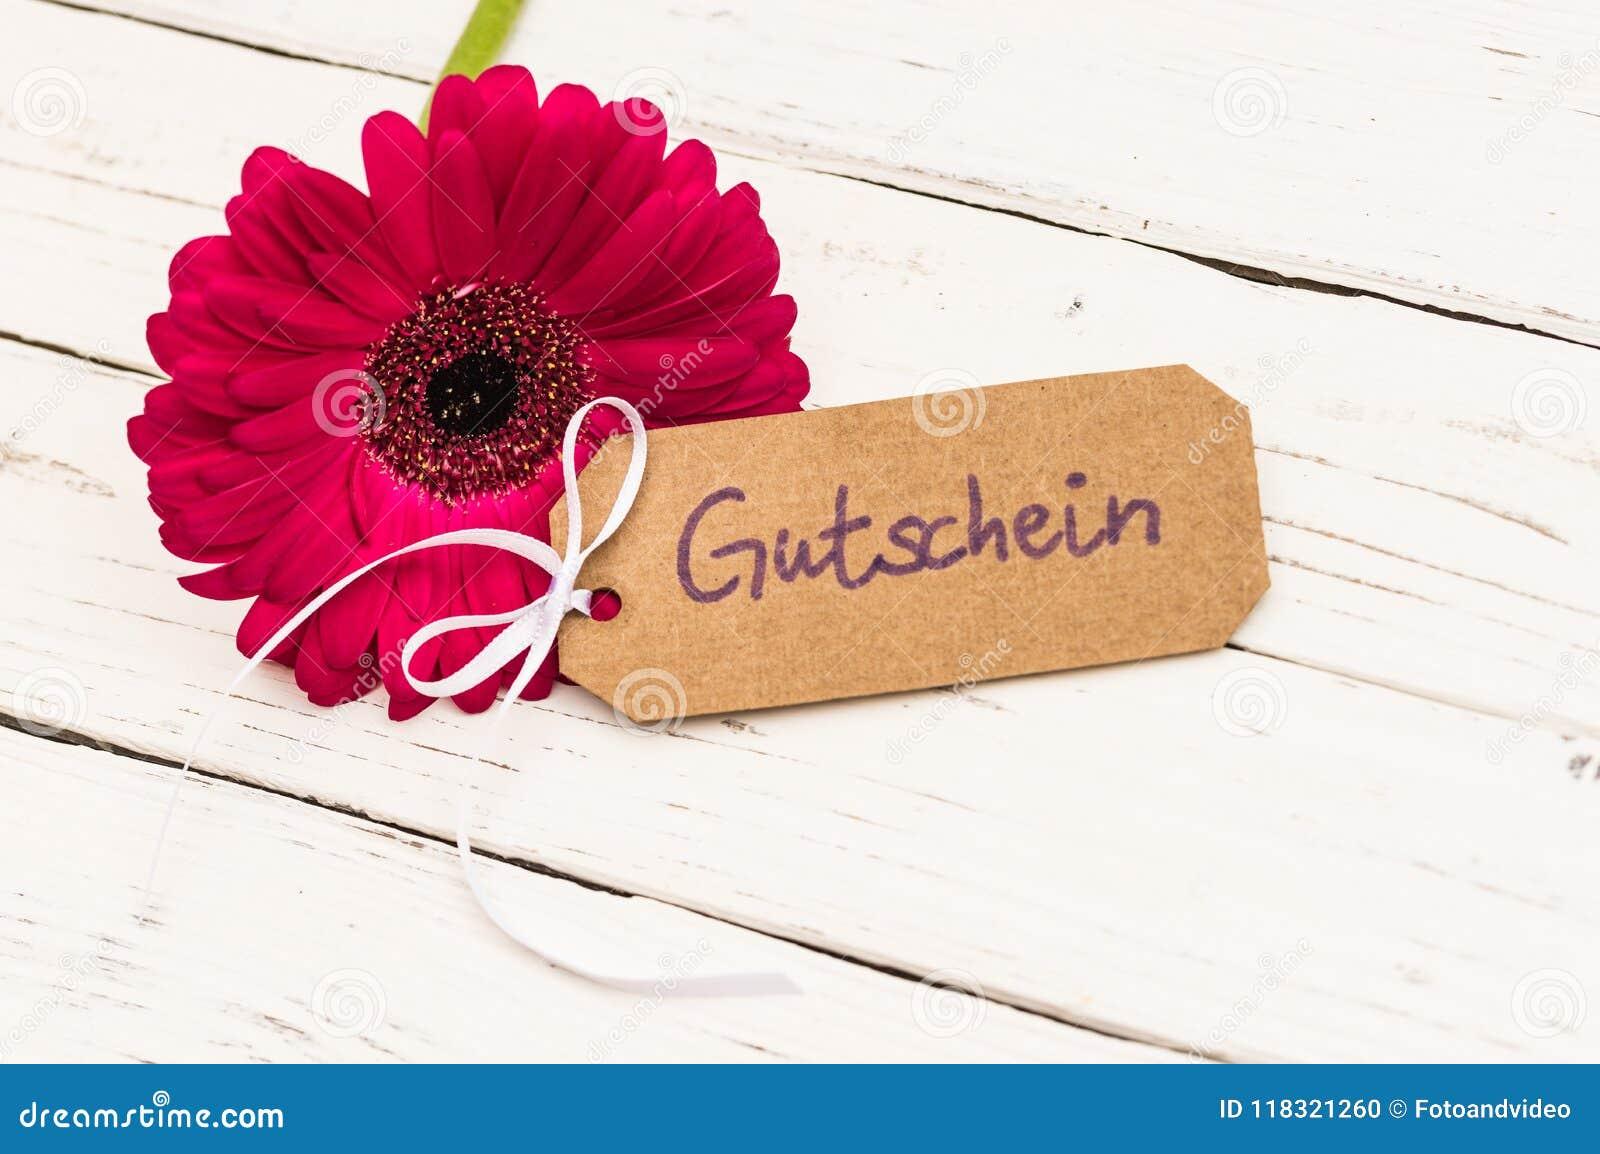 Gift Card With German Word Gutschein Means Voucher And Flower On